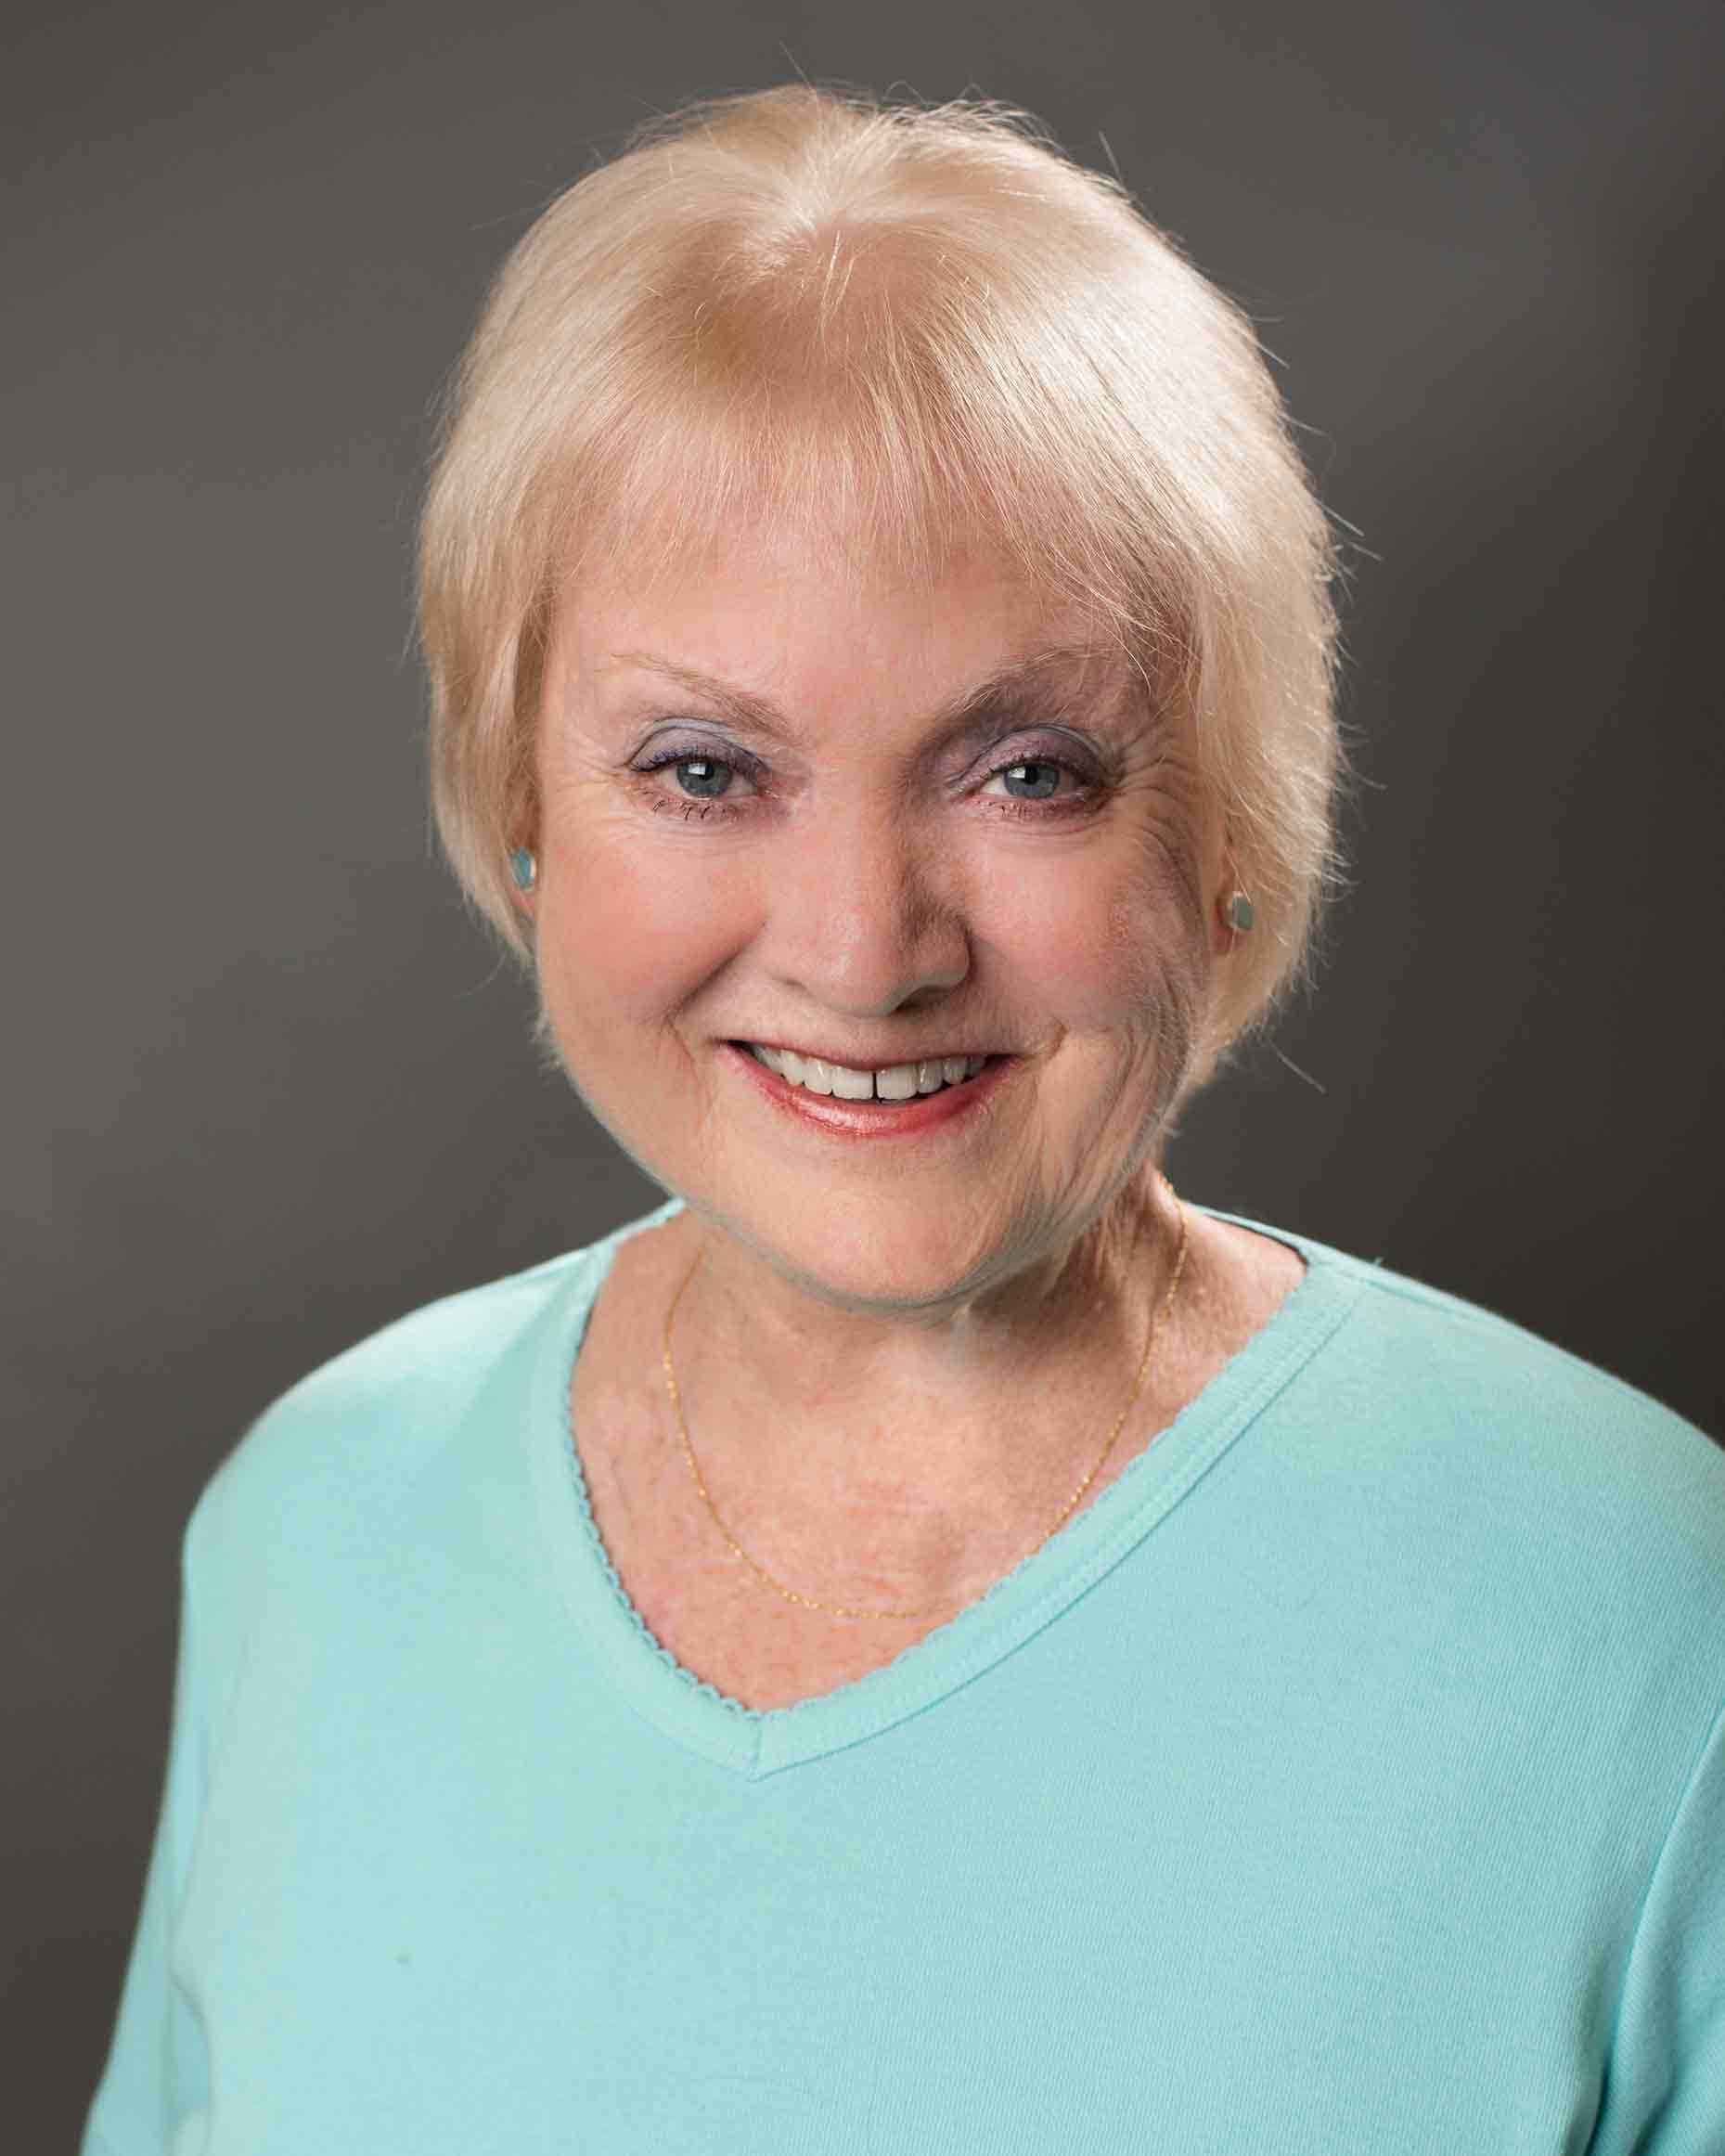 Kathy Merrill